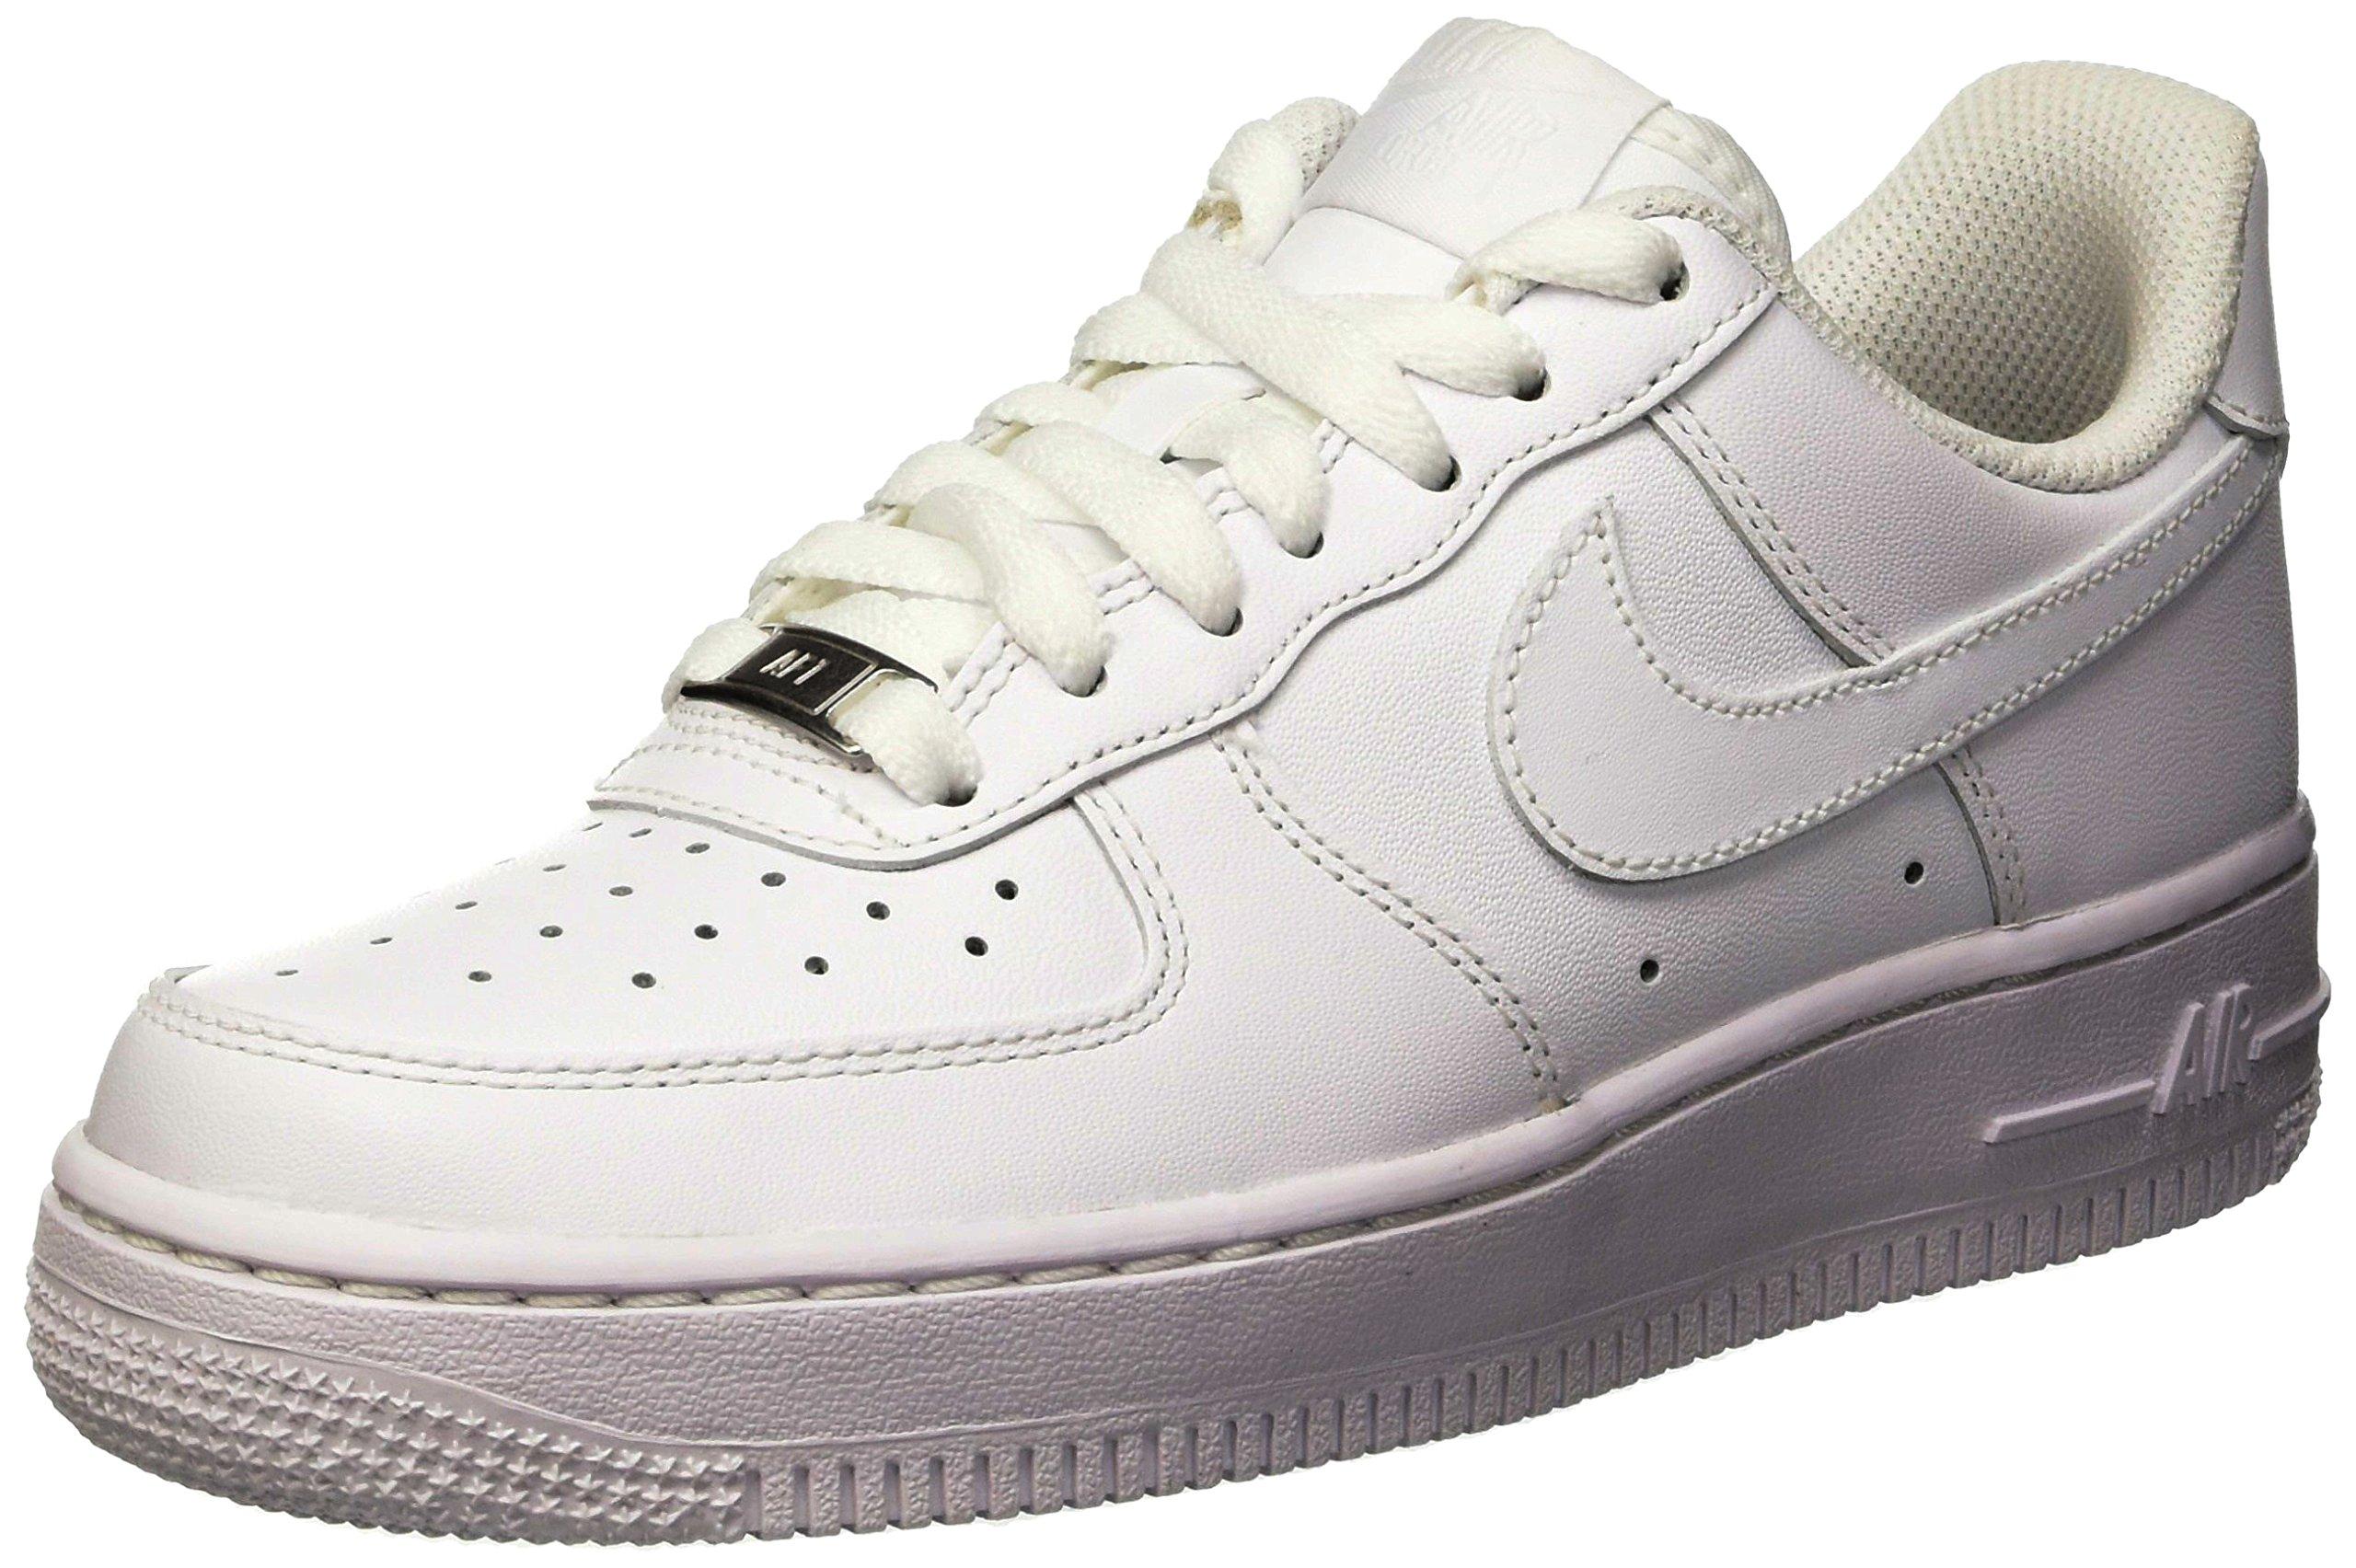 Wmns De Nike Force Sport 1 Eu 07Chaussures Air FemmeBlancwhite36 TulFcK1J3